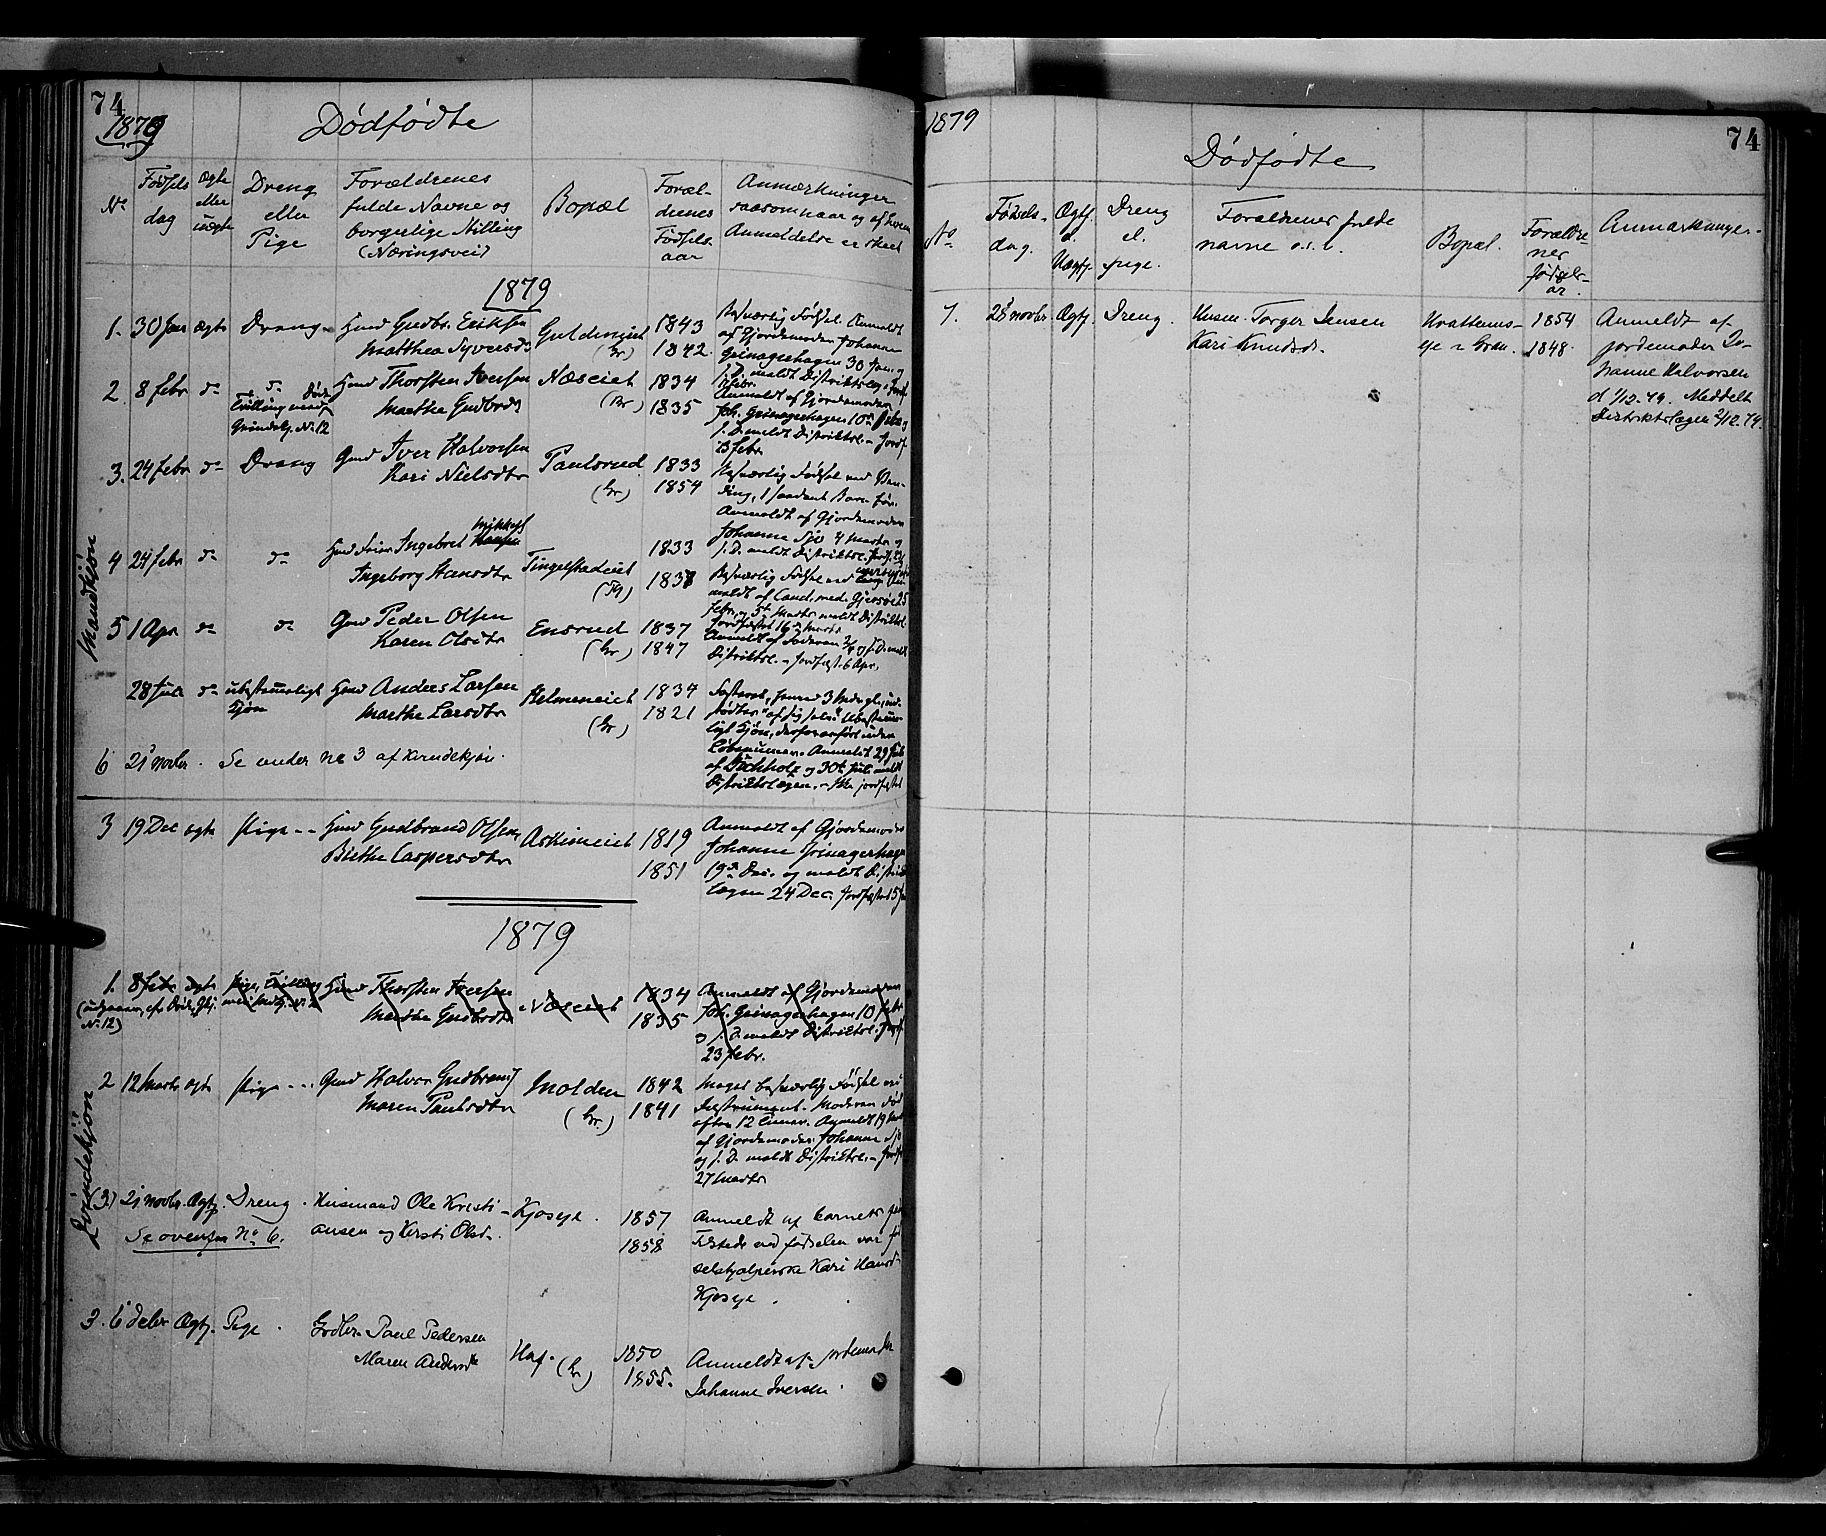 SAH, Gran prestekontor, Ministerialbok nr. 13, 1875-1879, s. 74